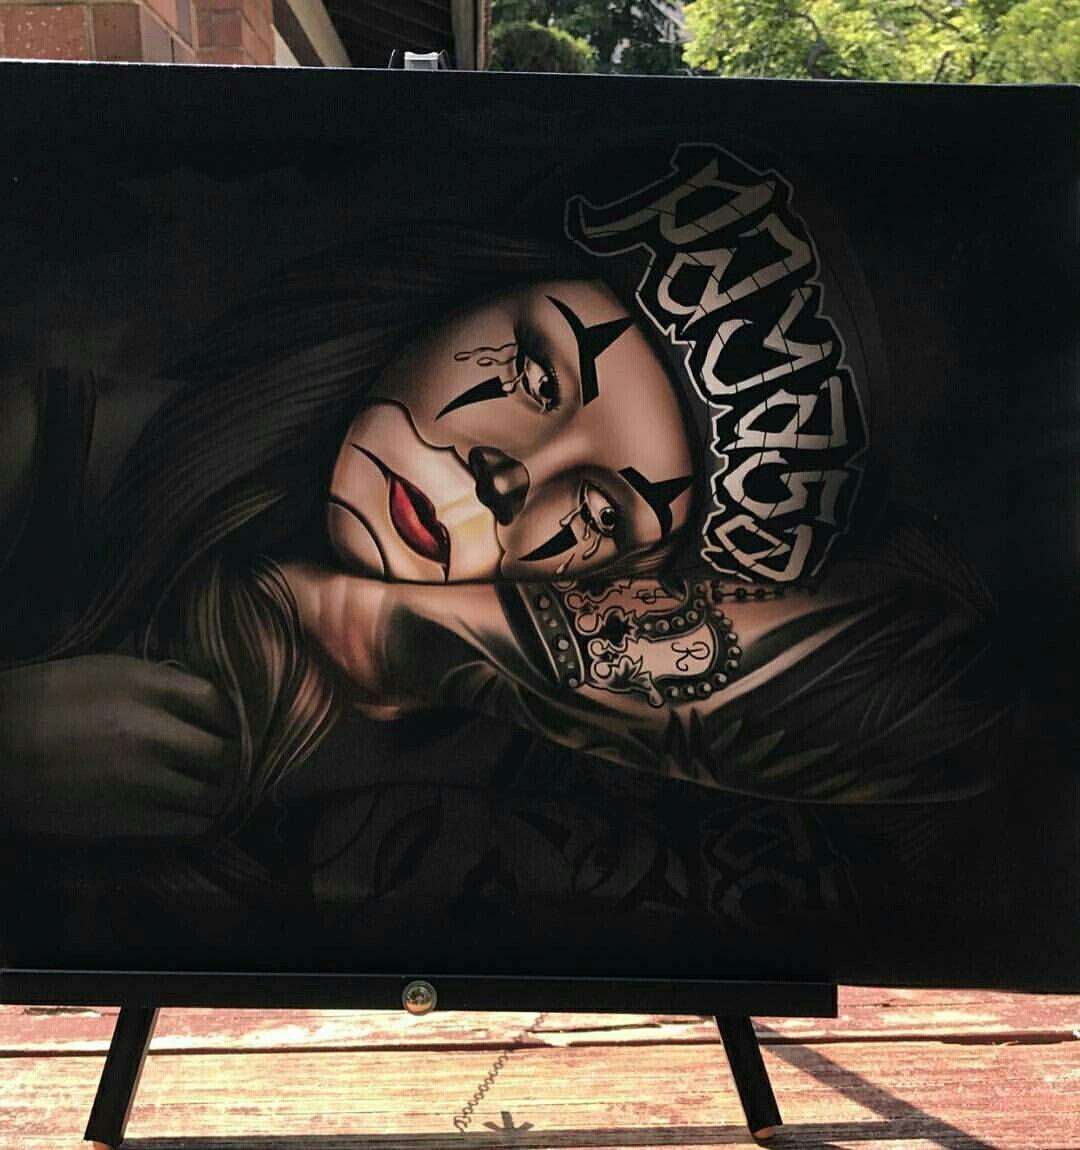 Cholos Cholas Azteca Tattoo Graffiti Gangster Weed Cannabis Charra Catrina Payasa Marihuana Calaveras Art Azteca Tattoo